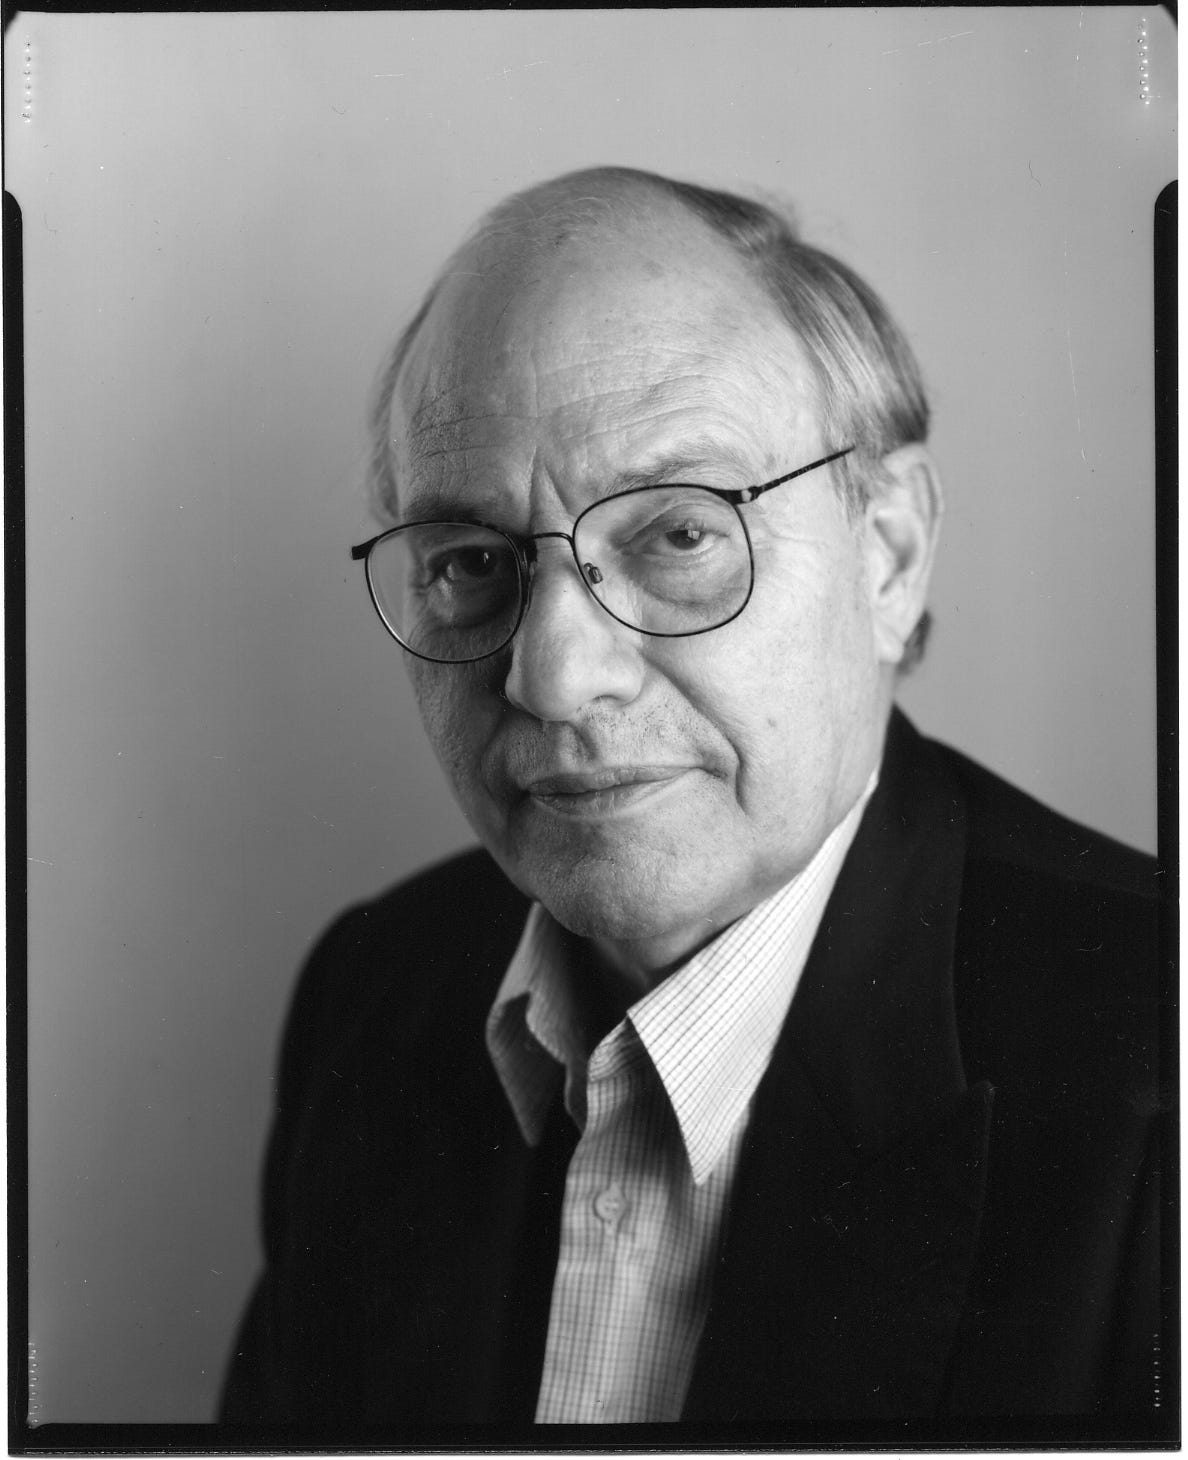 Hugh Nissenson